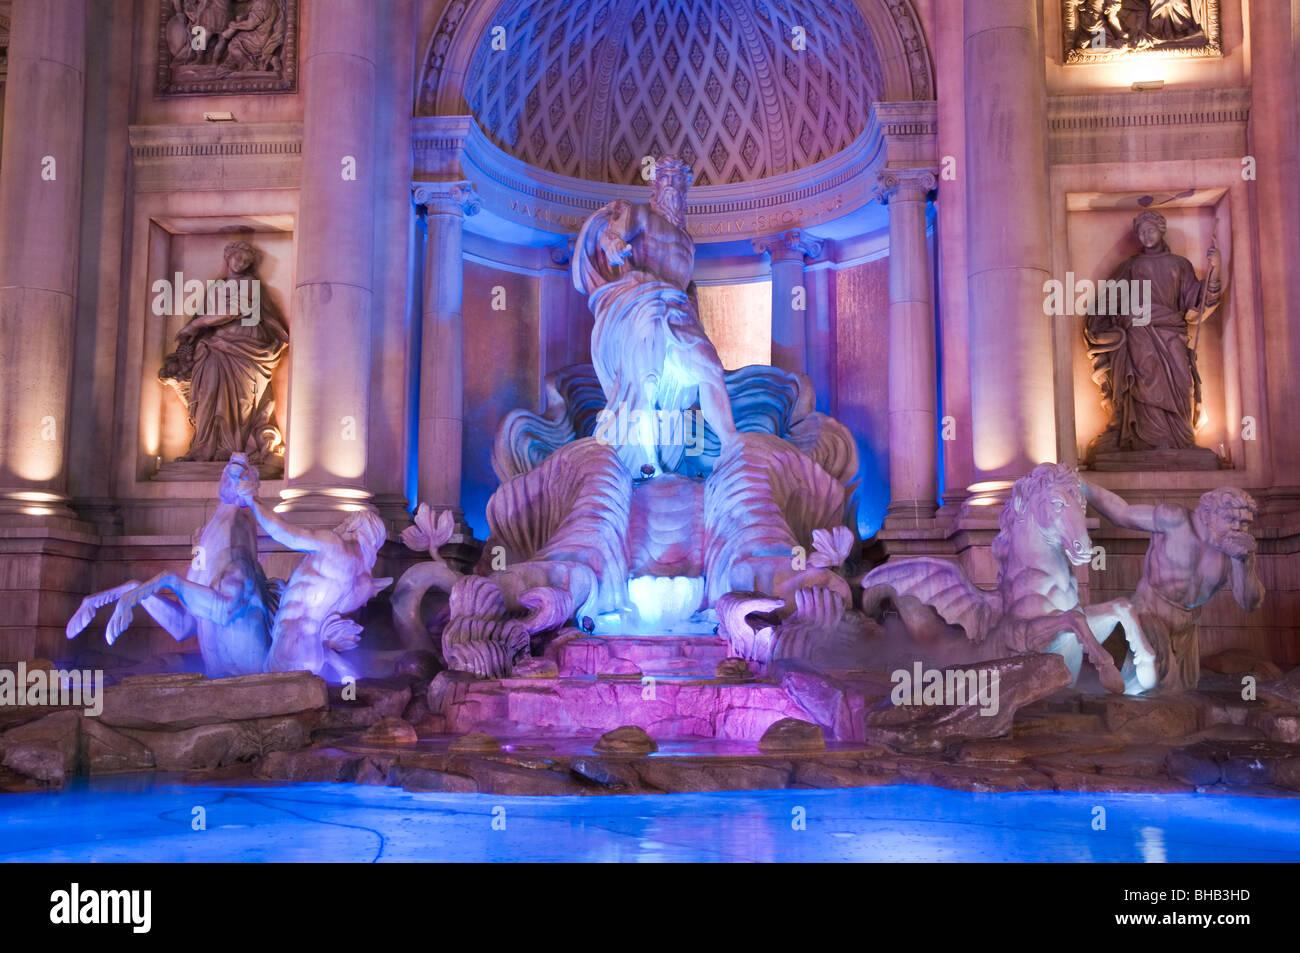 Replica of the Italian Trevi Fountain (Fontana di Trevi), Caesars Palace Hotel & Casino, Las Vegas, Nevada, - Stock Image